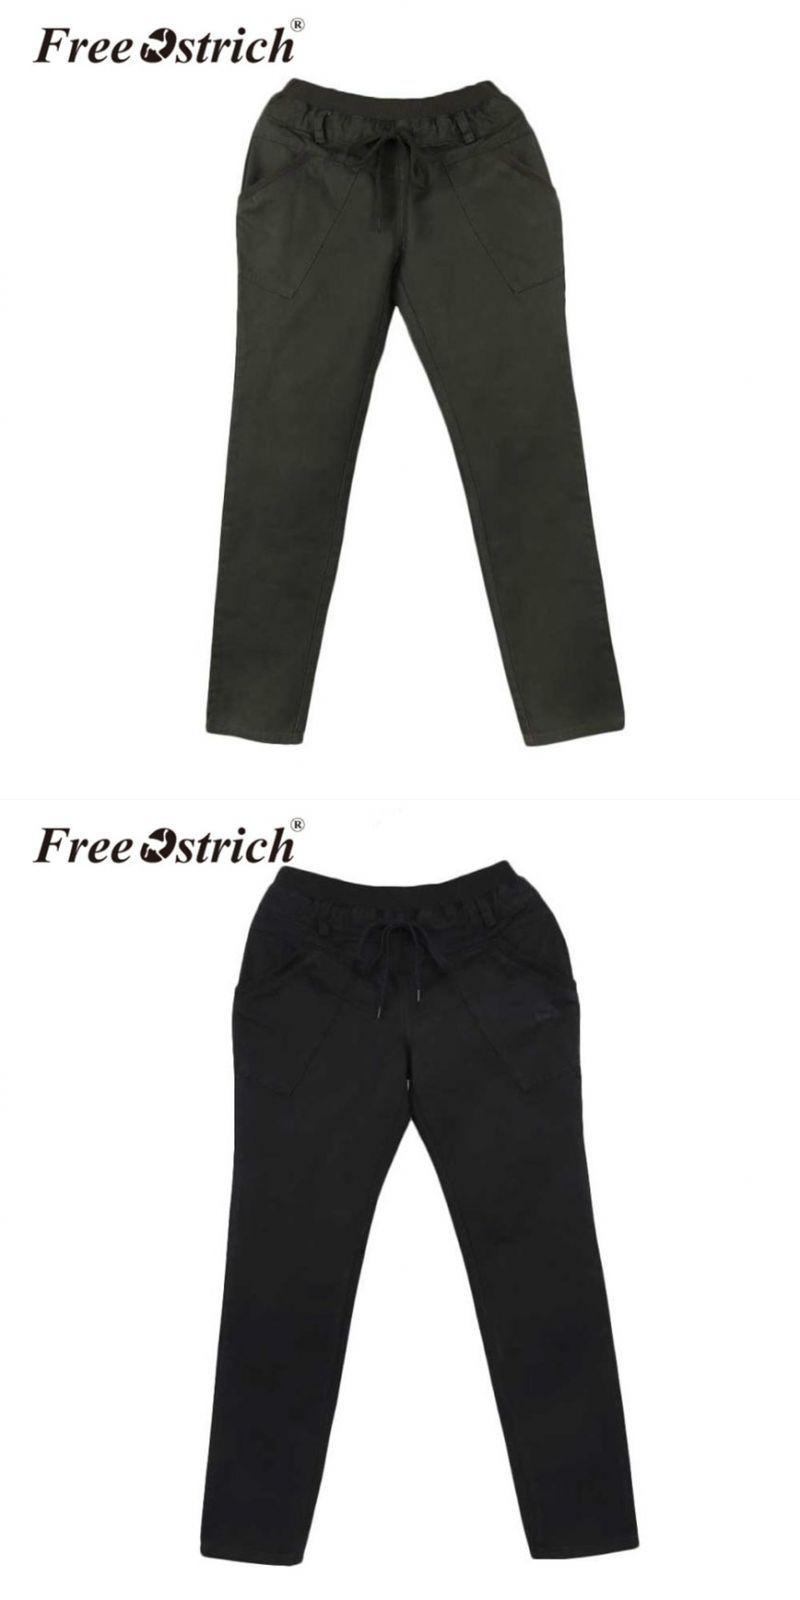 3f76bce932a Denim harem pants women casual solid elastic waist pleated pocket full  length trousers women s40  polyester